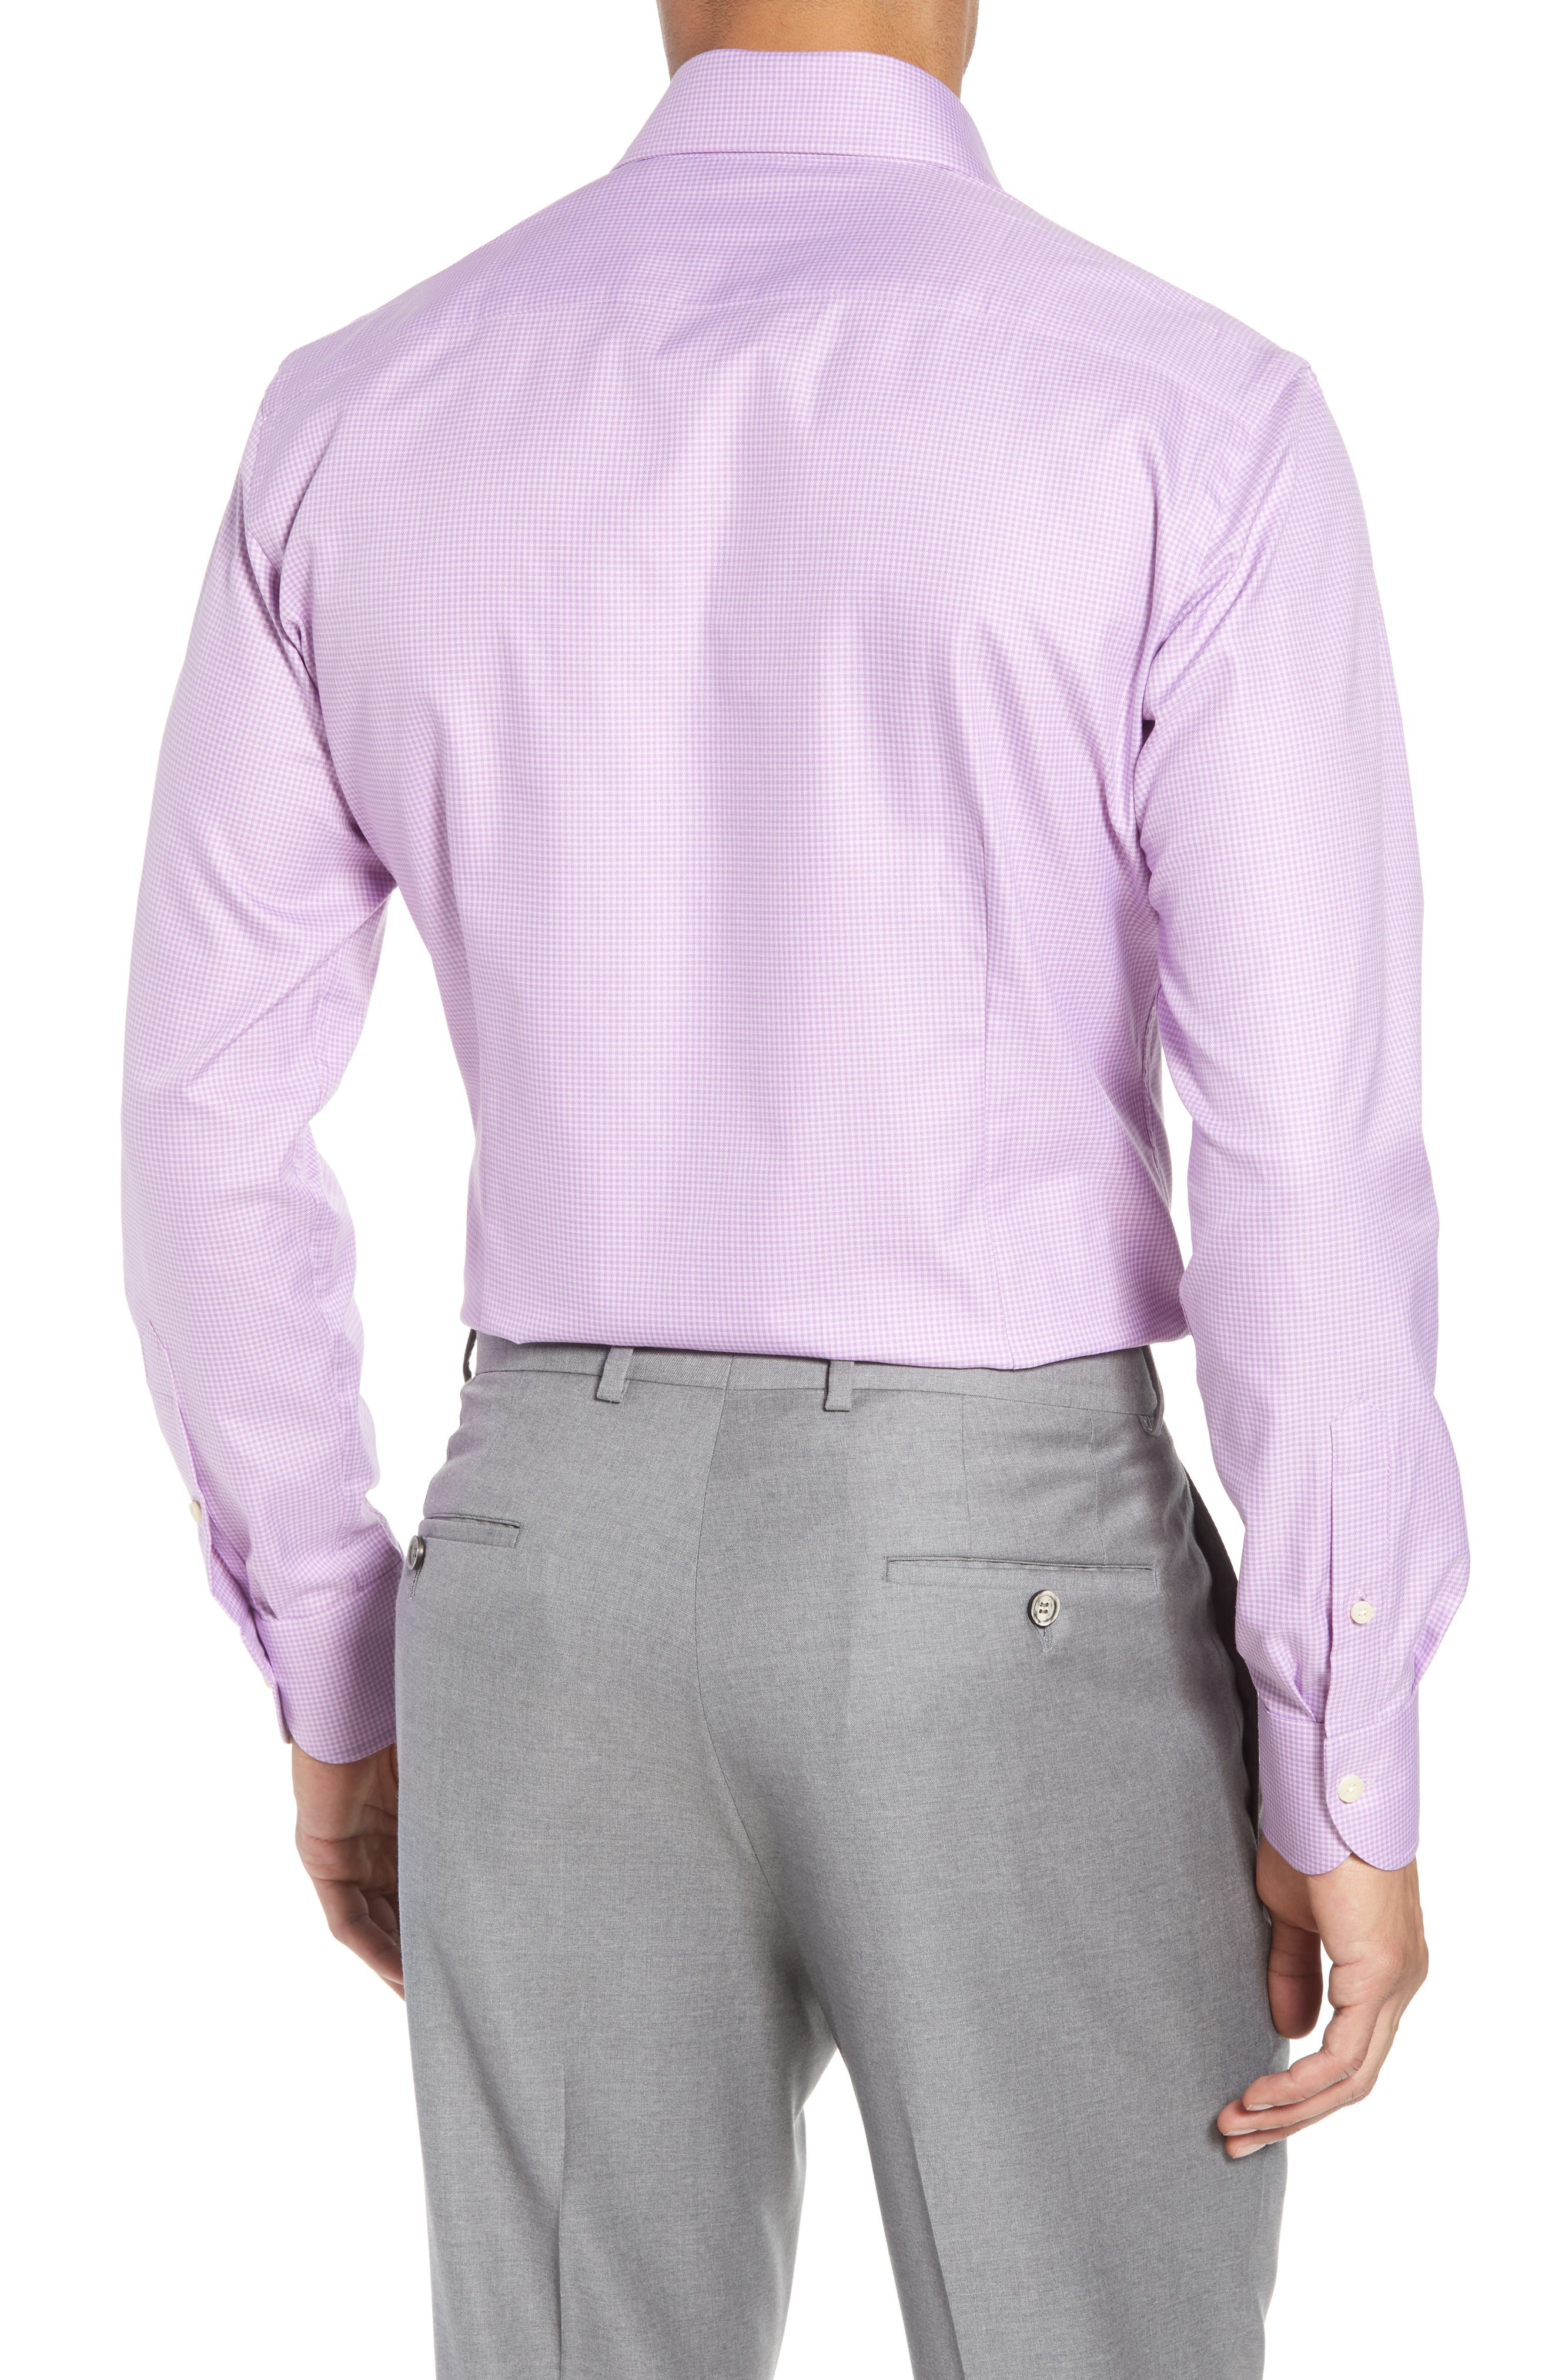 Innis Slim Fit Check Dress Shirt,                             Alternate thumbnail 2, color,                             Lilac